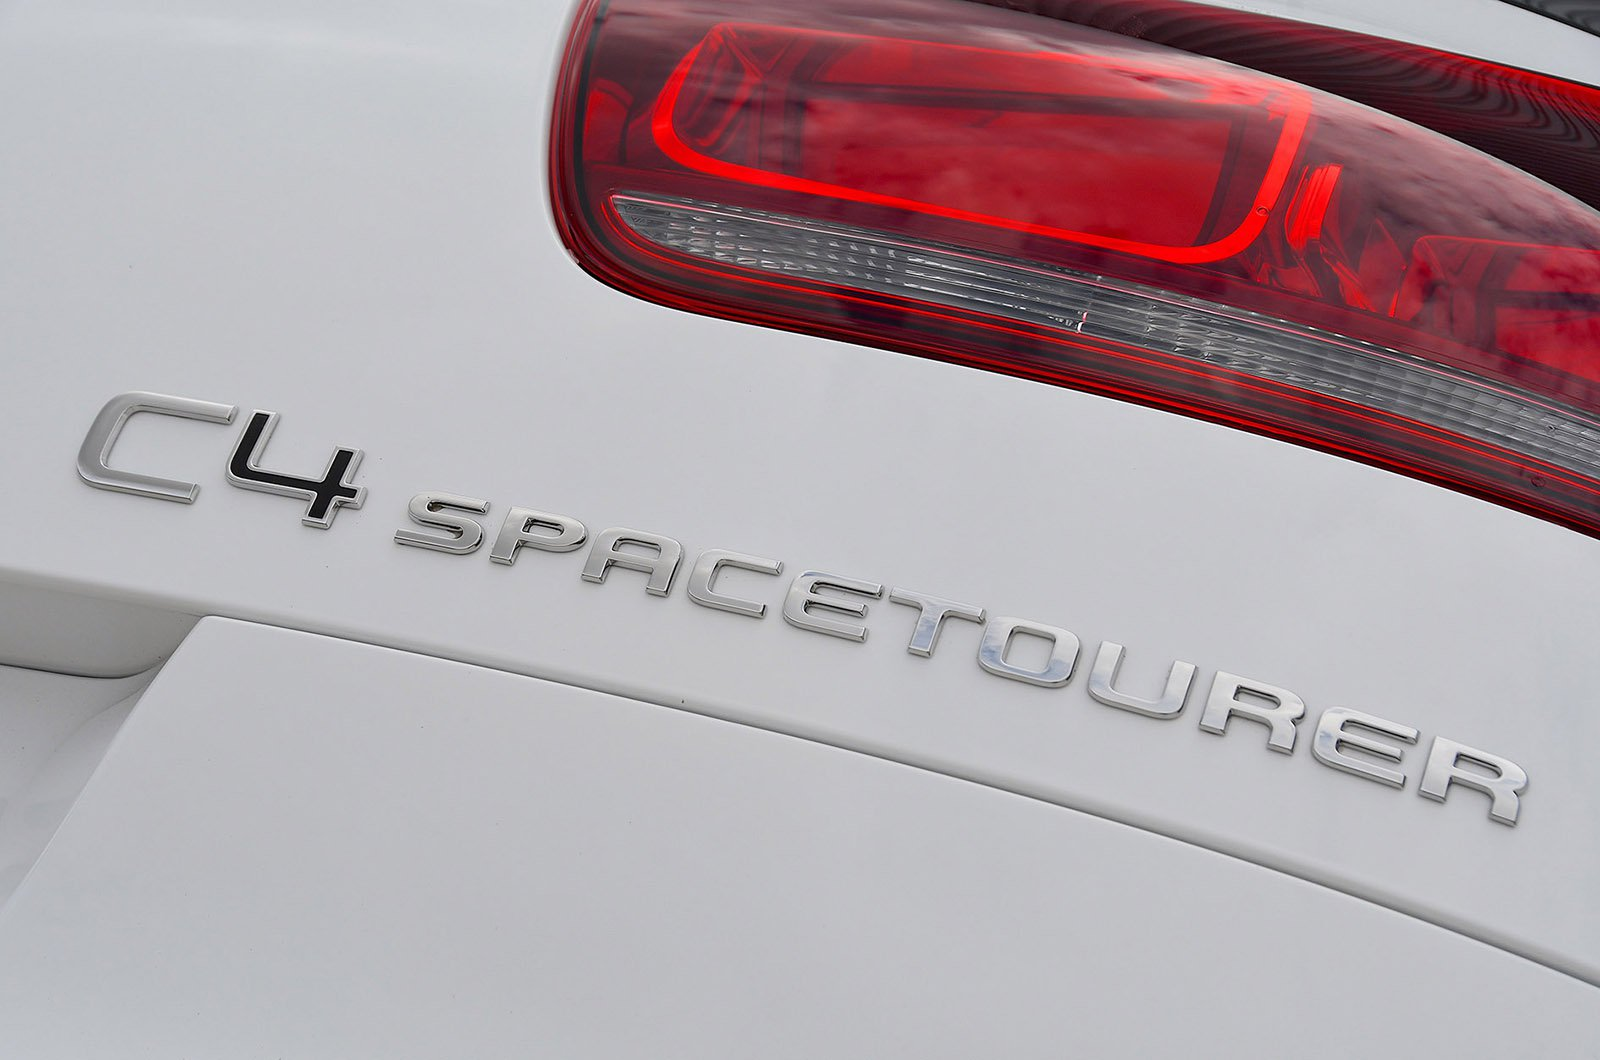 Citroën C4 Spacetourer badge